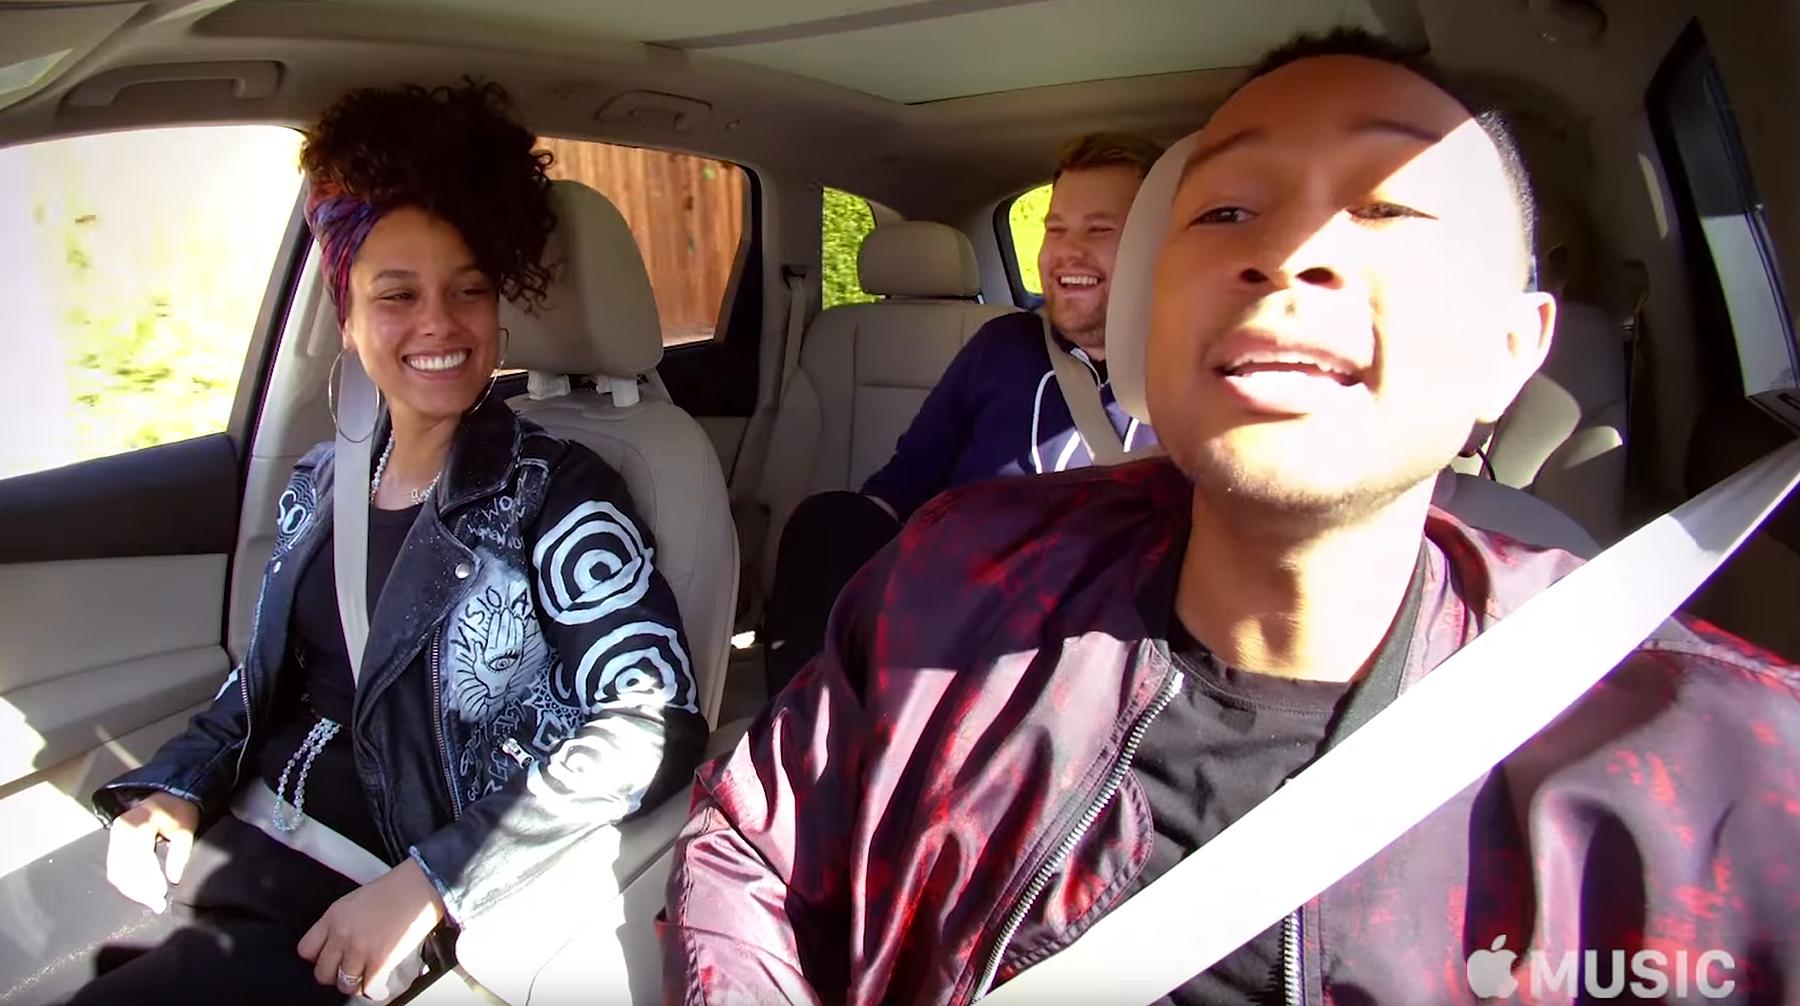 Alicia Keys, James Corden, and John Legend do Carpool Karaoke